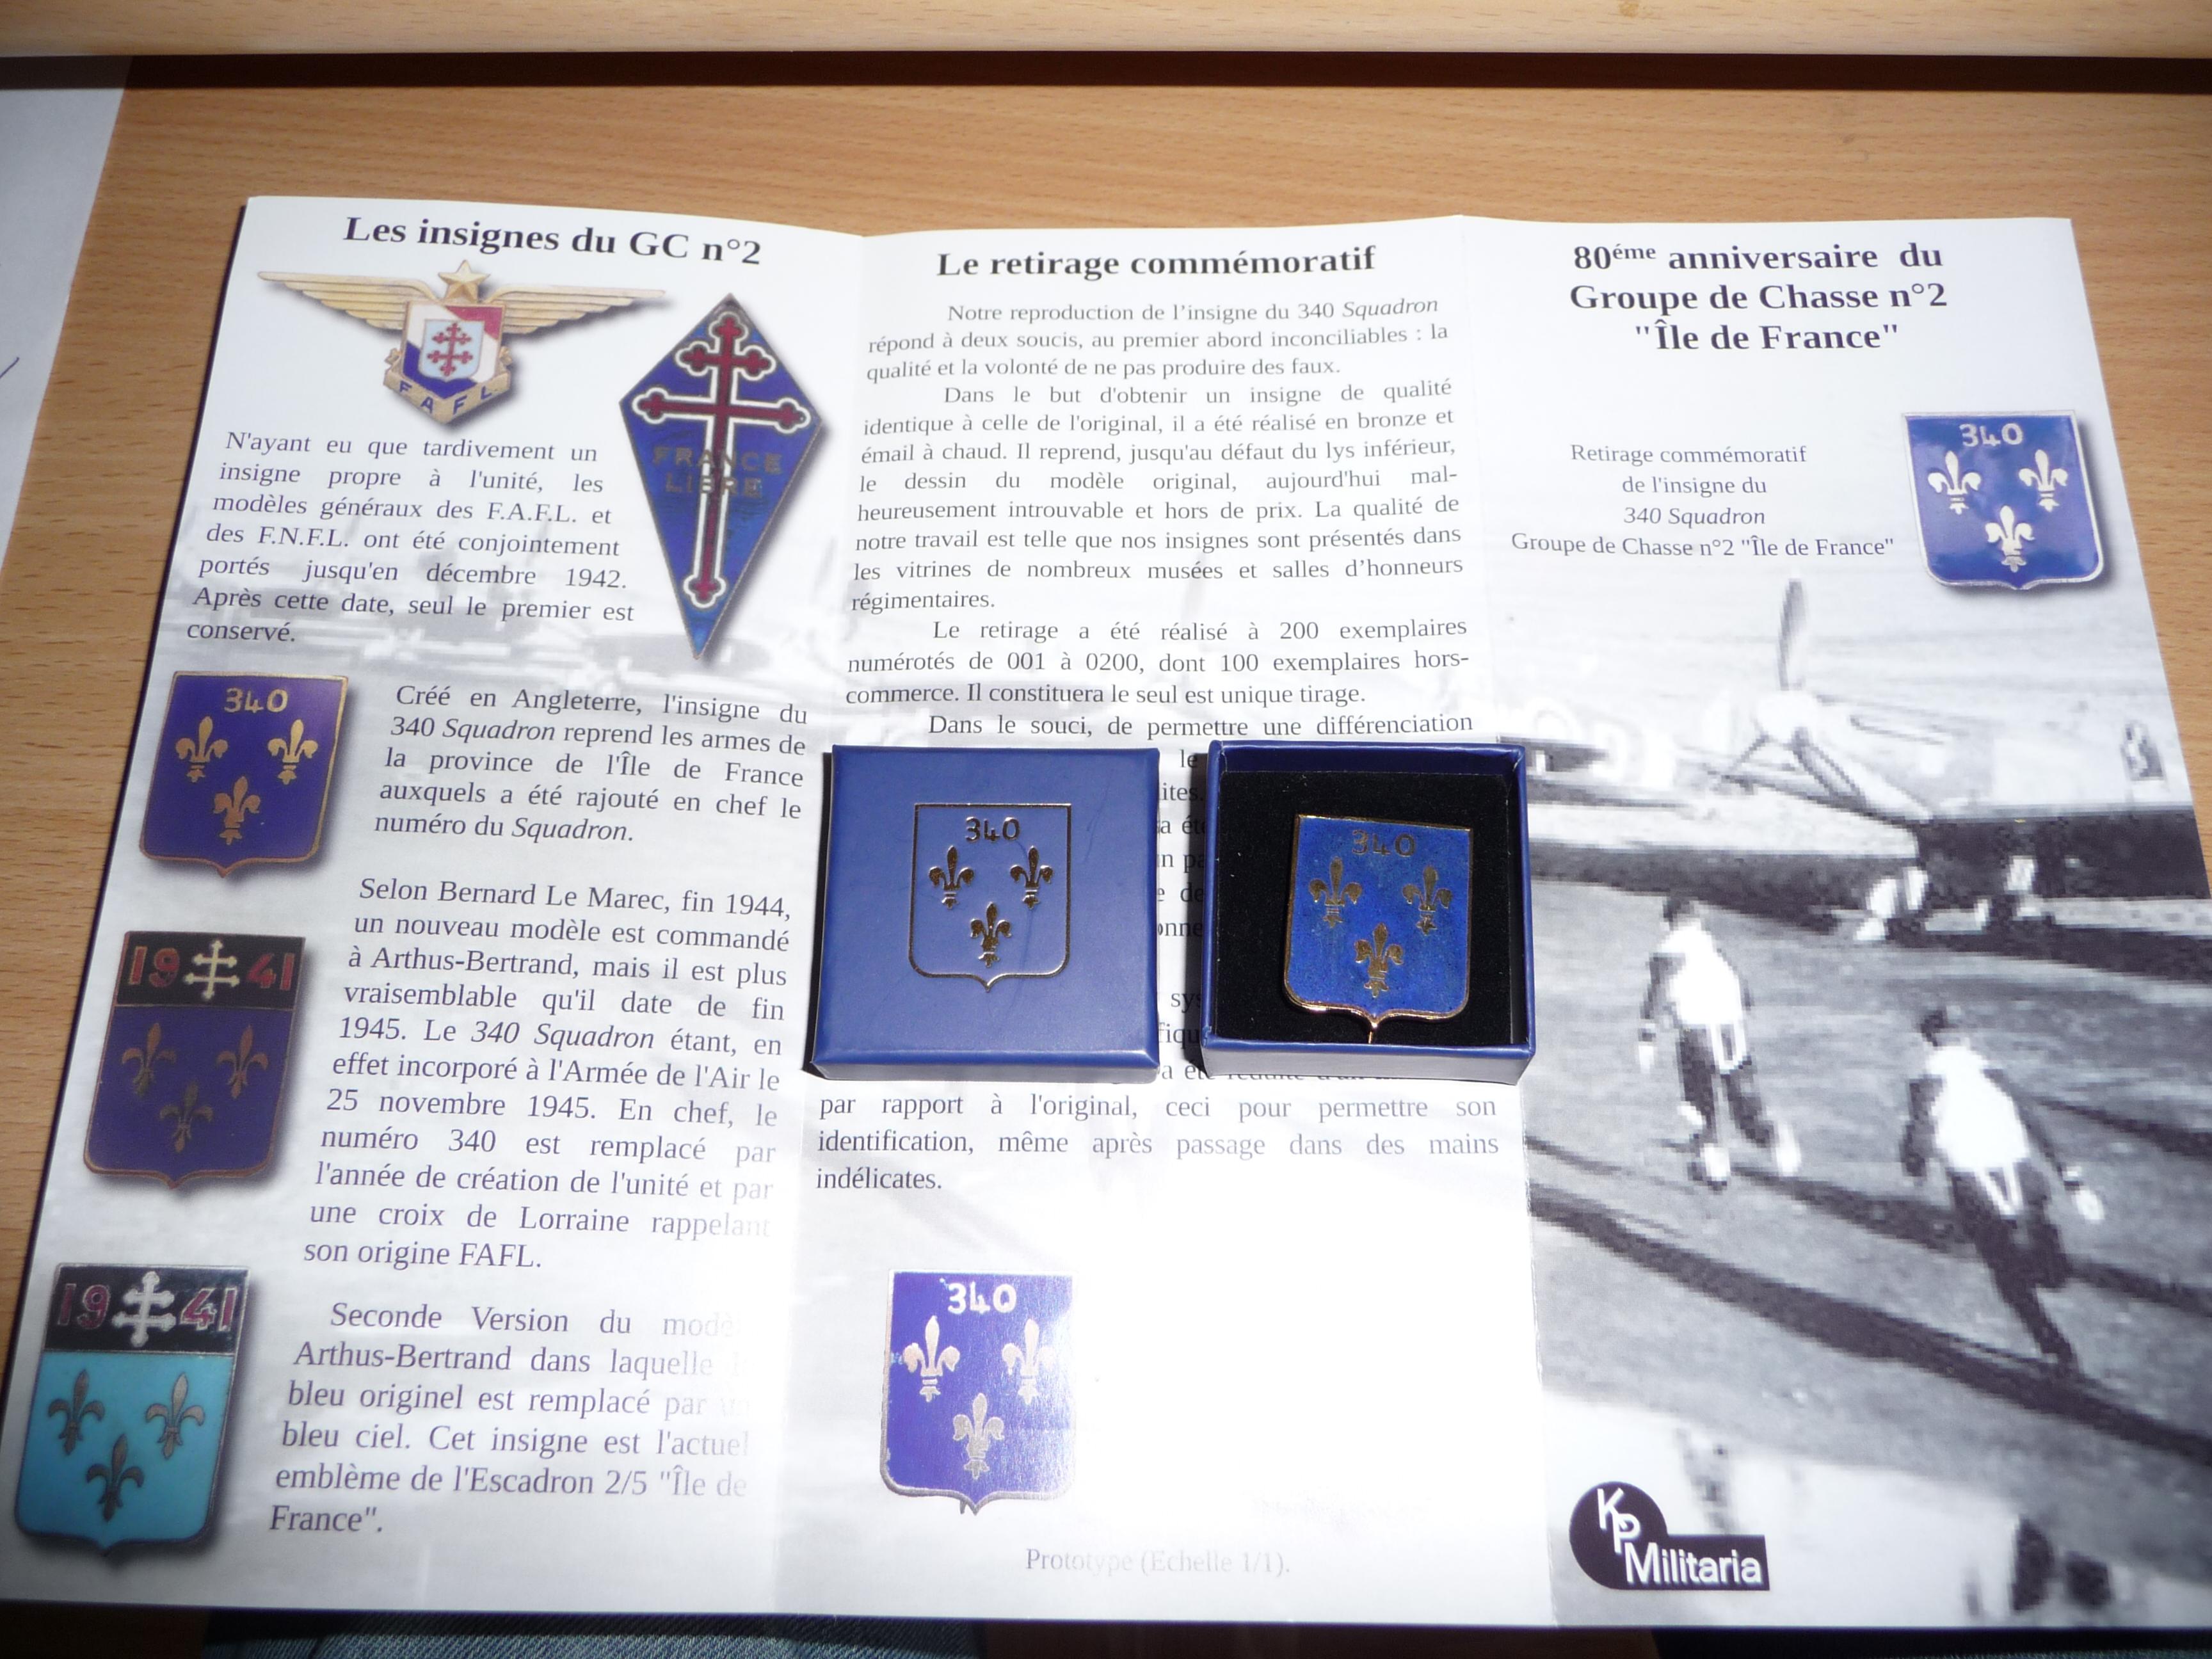 Insignia of the RAF (French) Squadron 340FAFL GC2 Ile de France